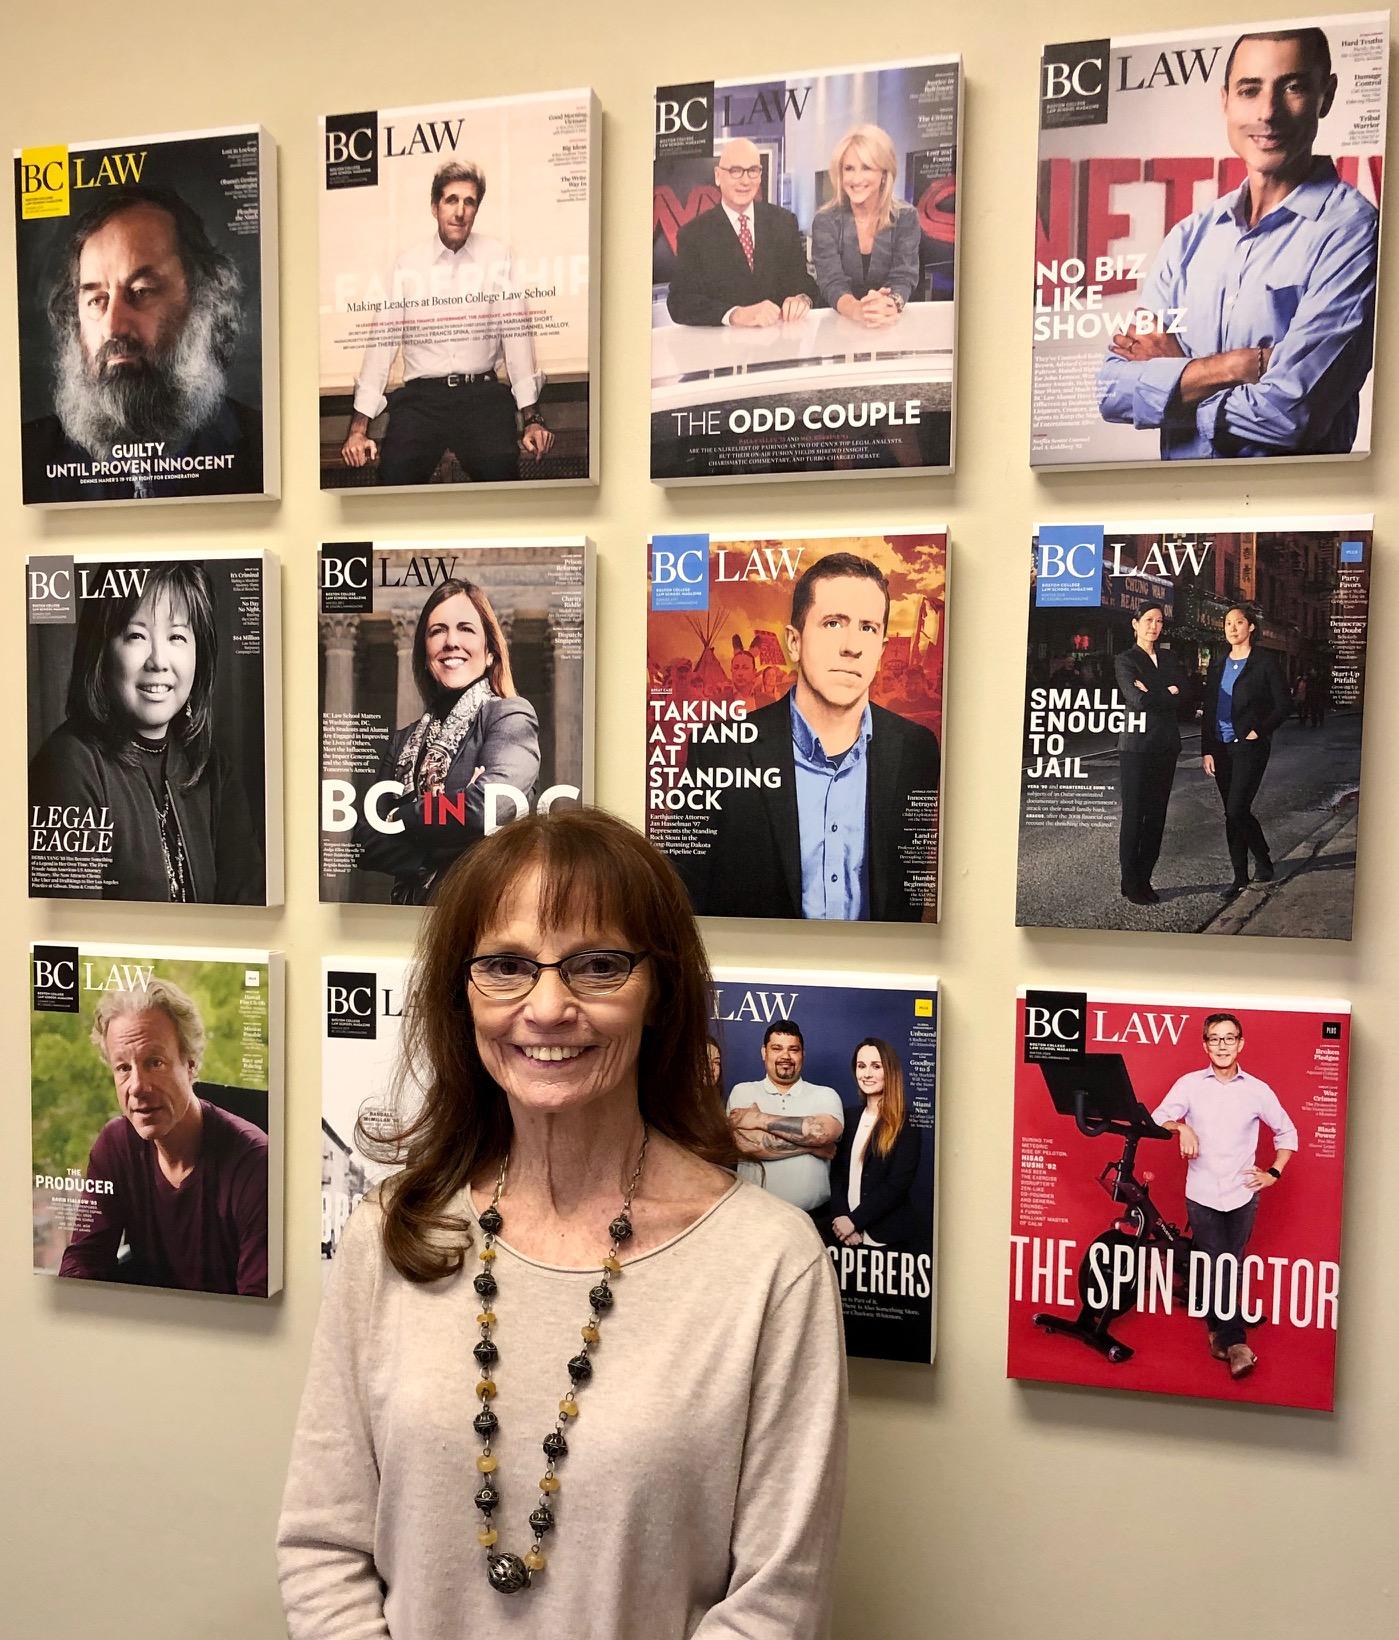 Magazine editor Vicki Sanders